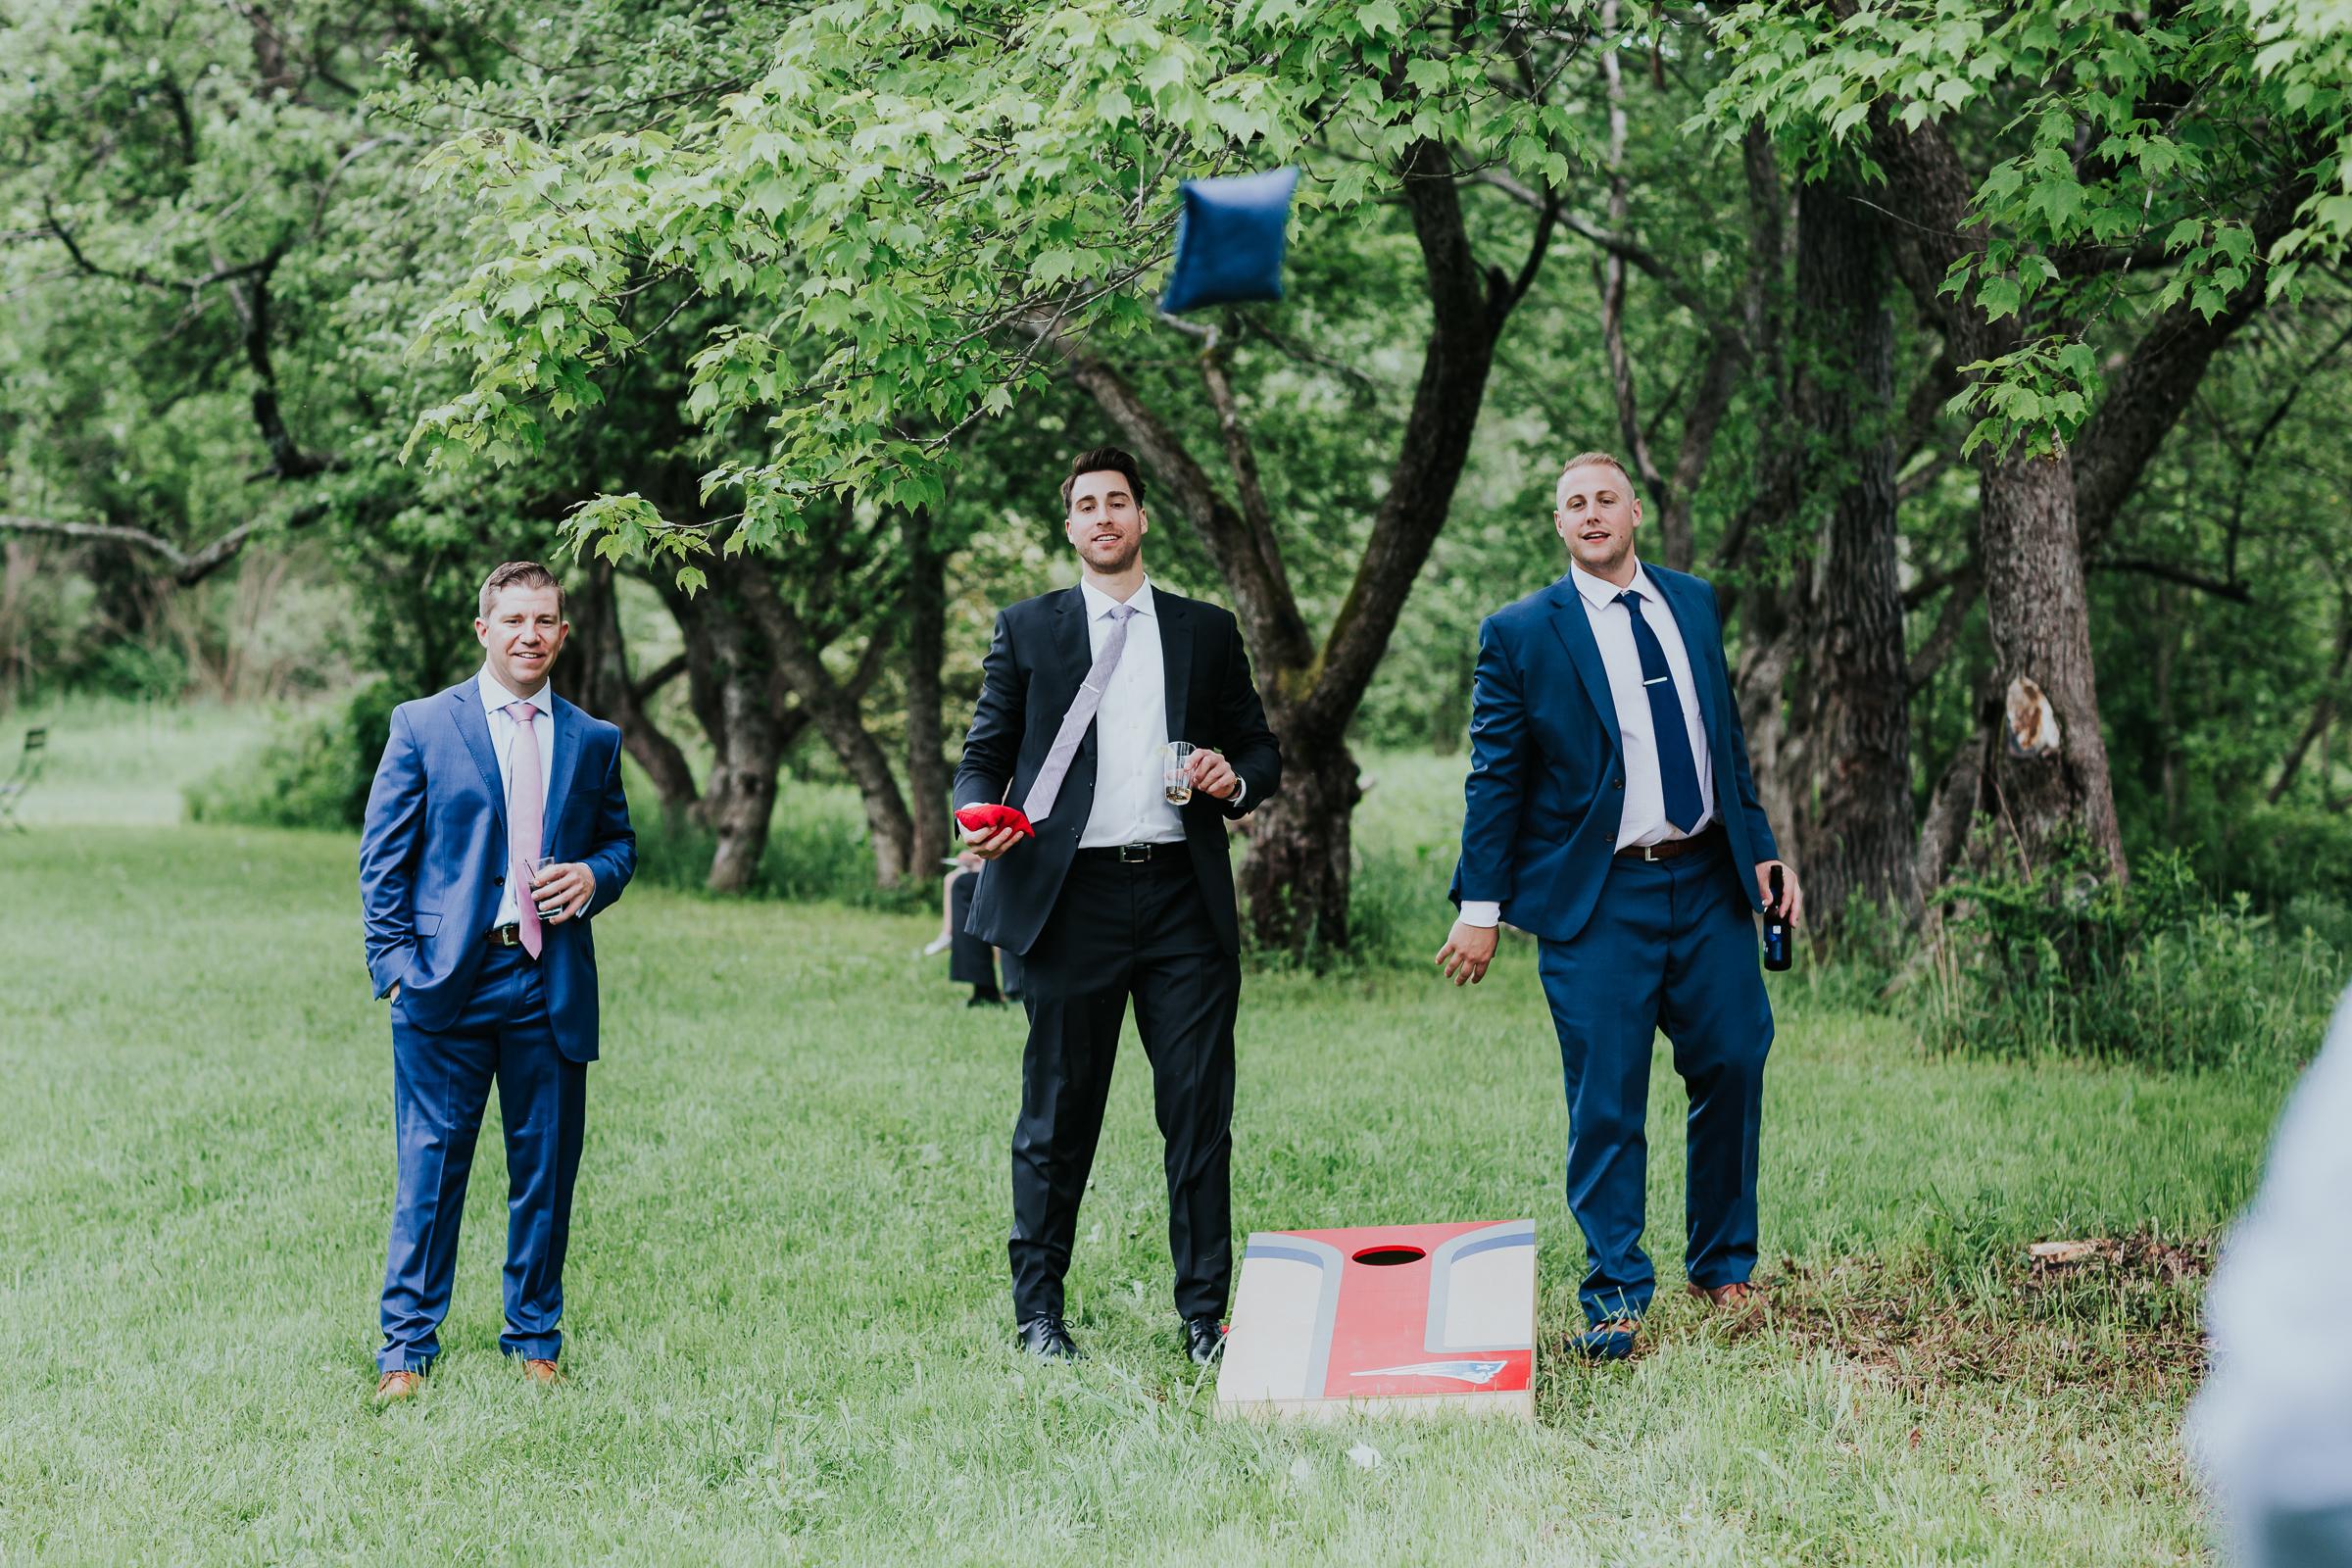 Handsome-Hollow-Long-Eddy-Catskills-New-York-Fine-Art-Documentary-Wedding-Photographer-80.jpg